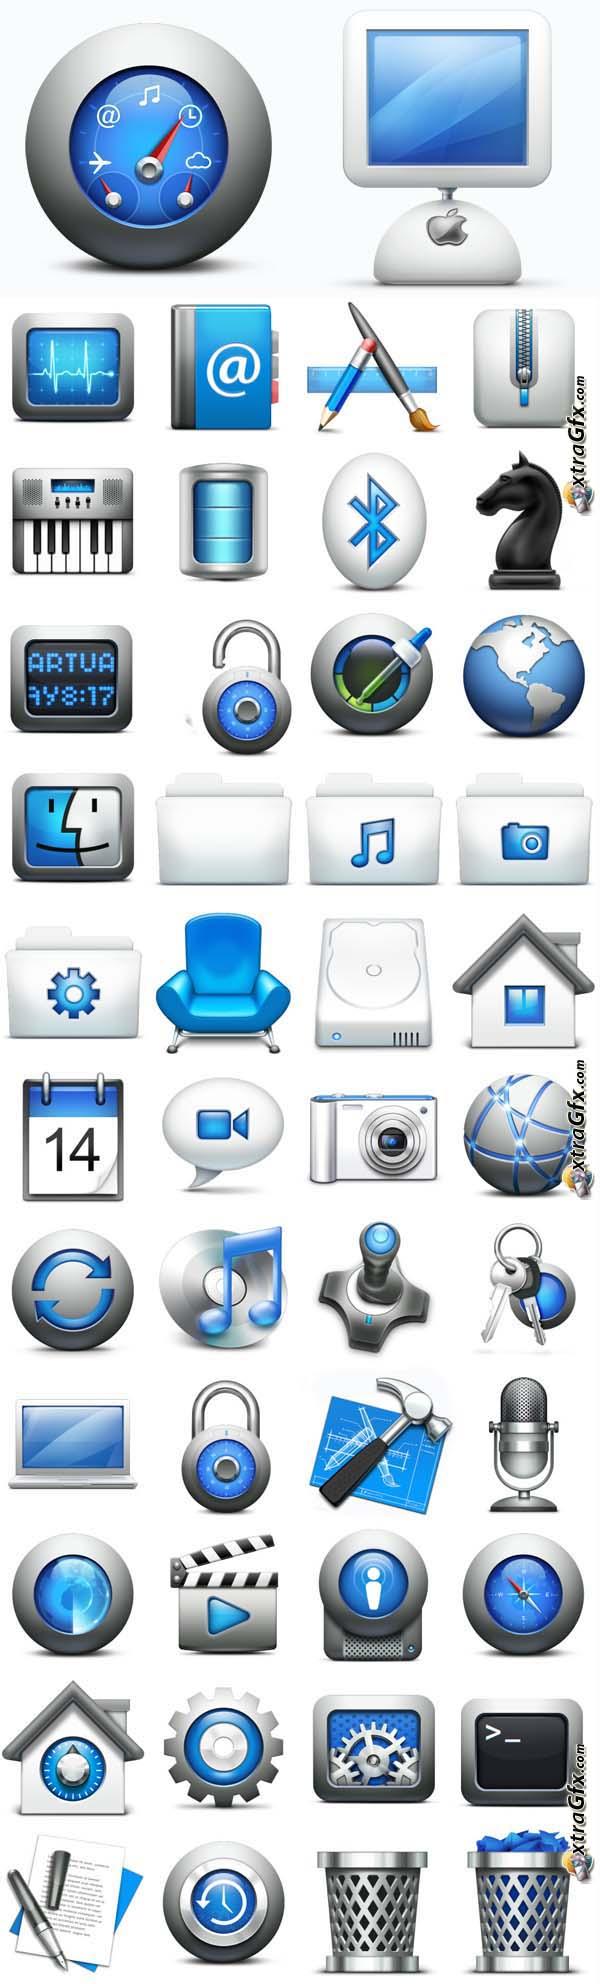 Mac OS X Style Icons 過去